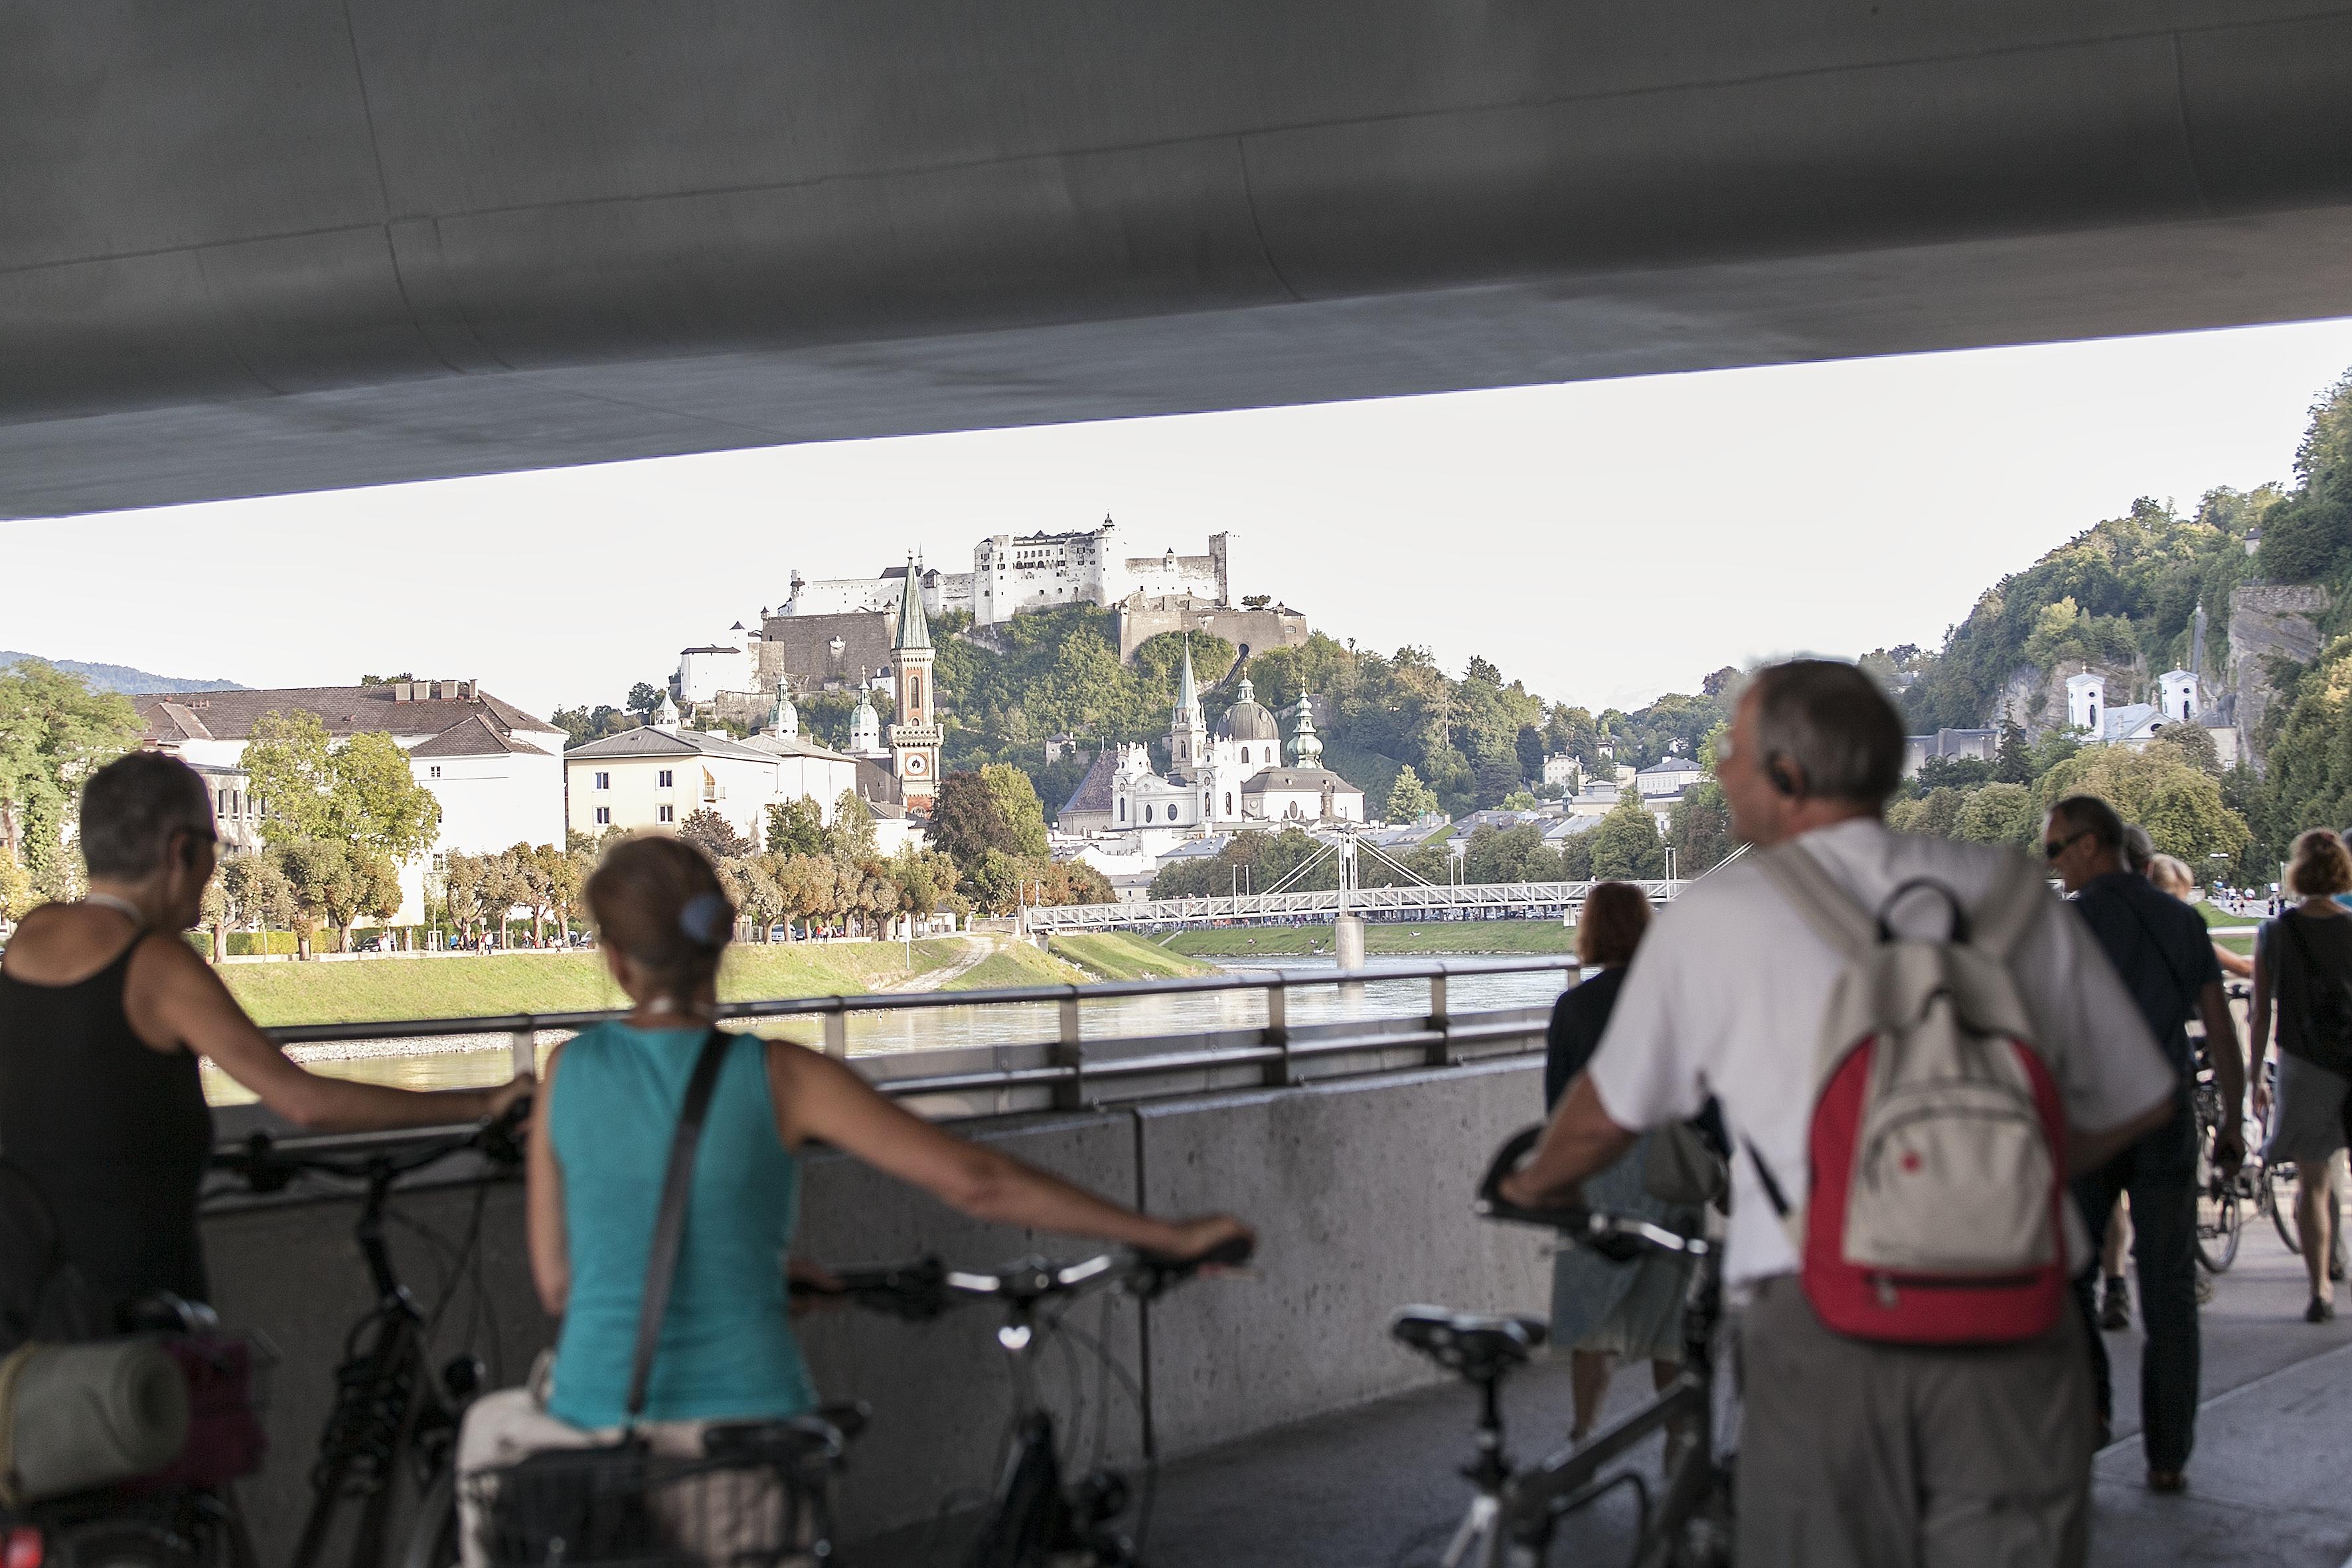 Stadtspaziergang 2015, Foto: Mira Turba